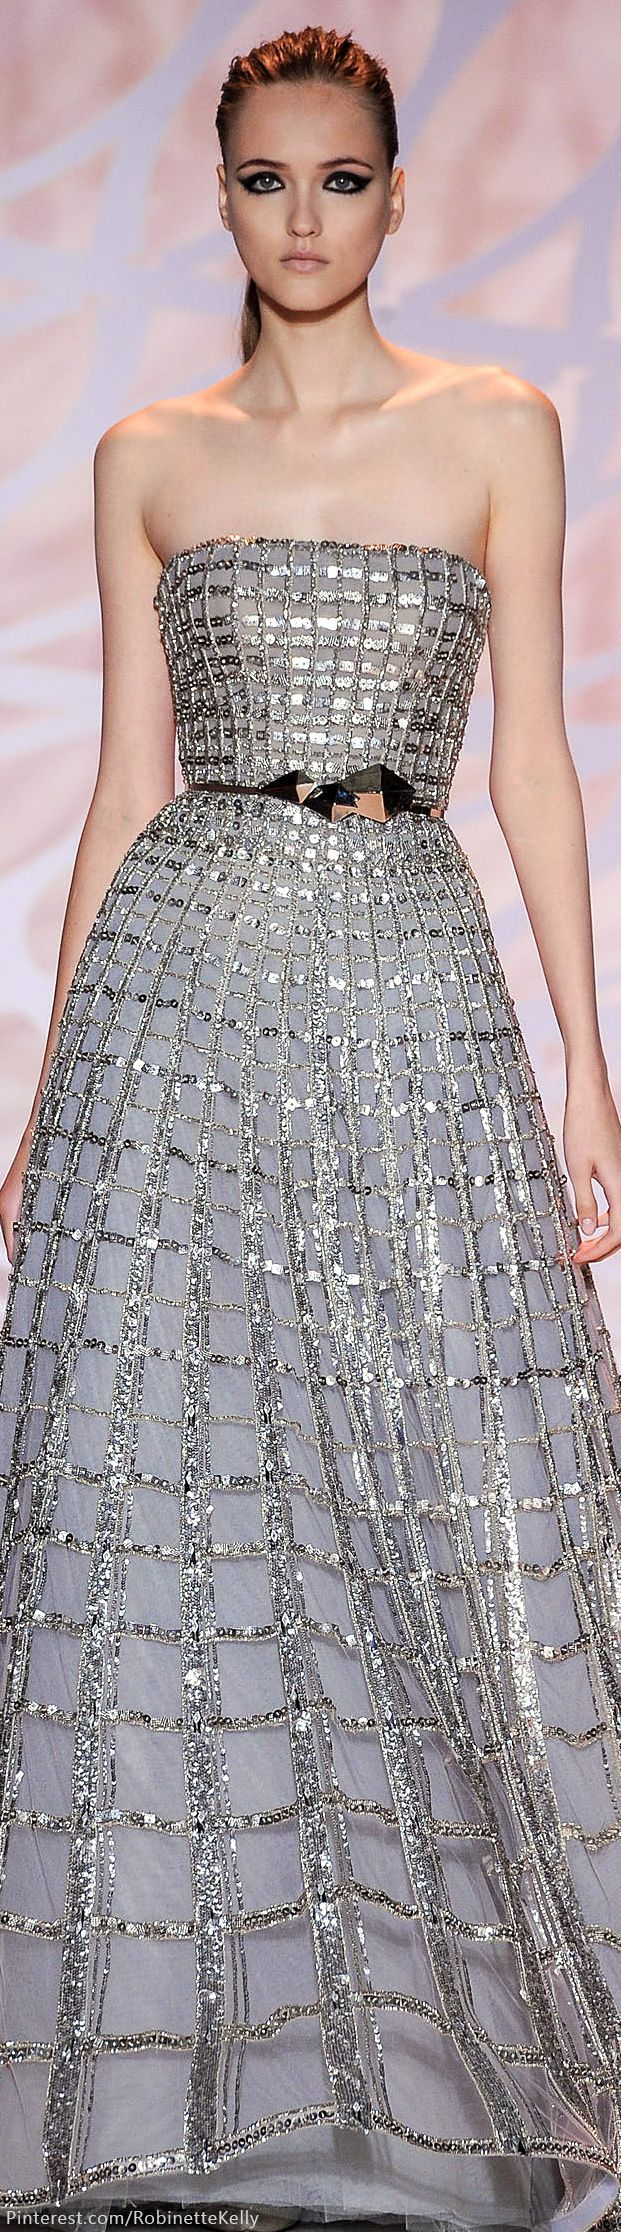 Gown by Zuhair Murad 2015: